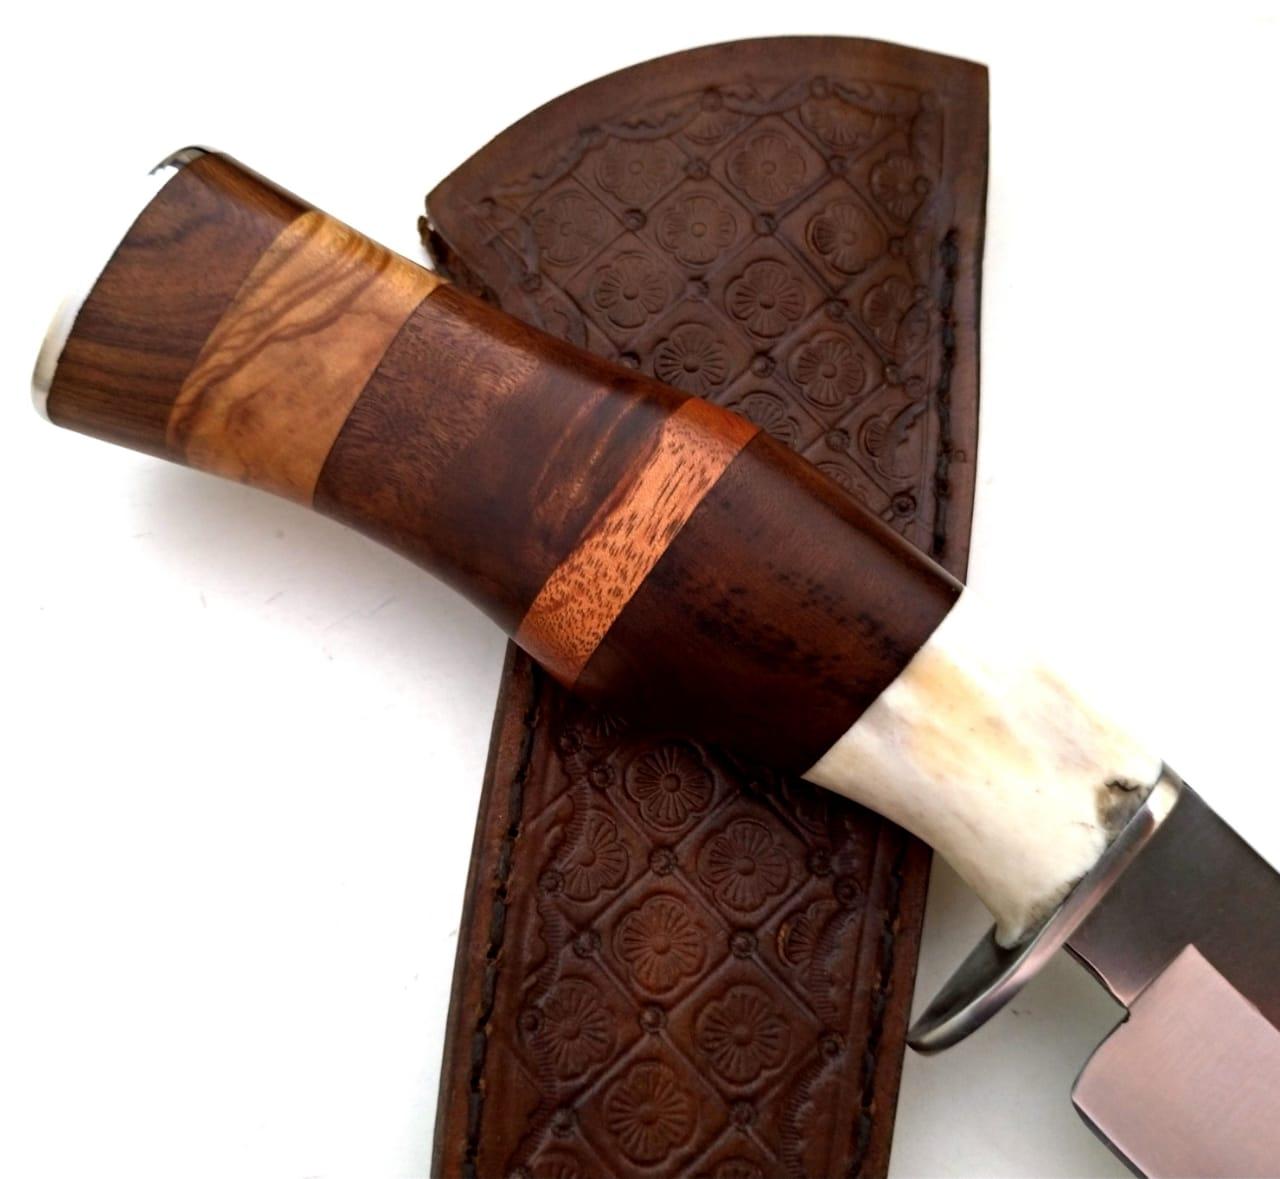 Faca artesanal inox Bowie Axis Mix Wood